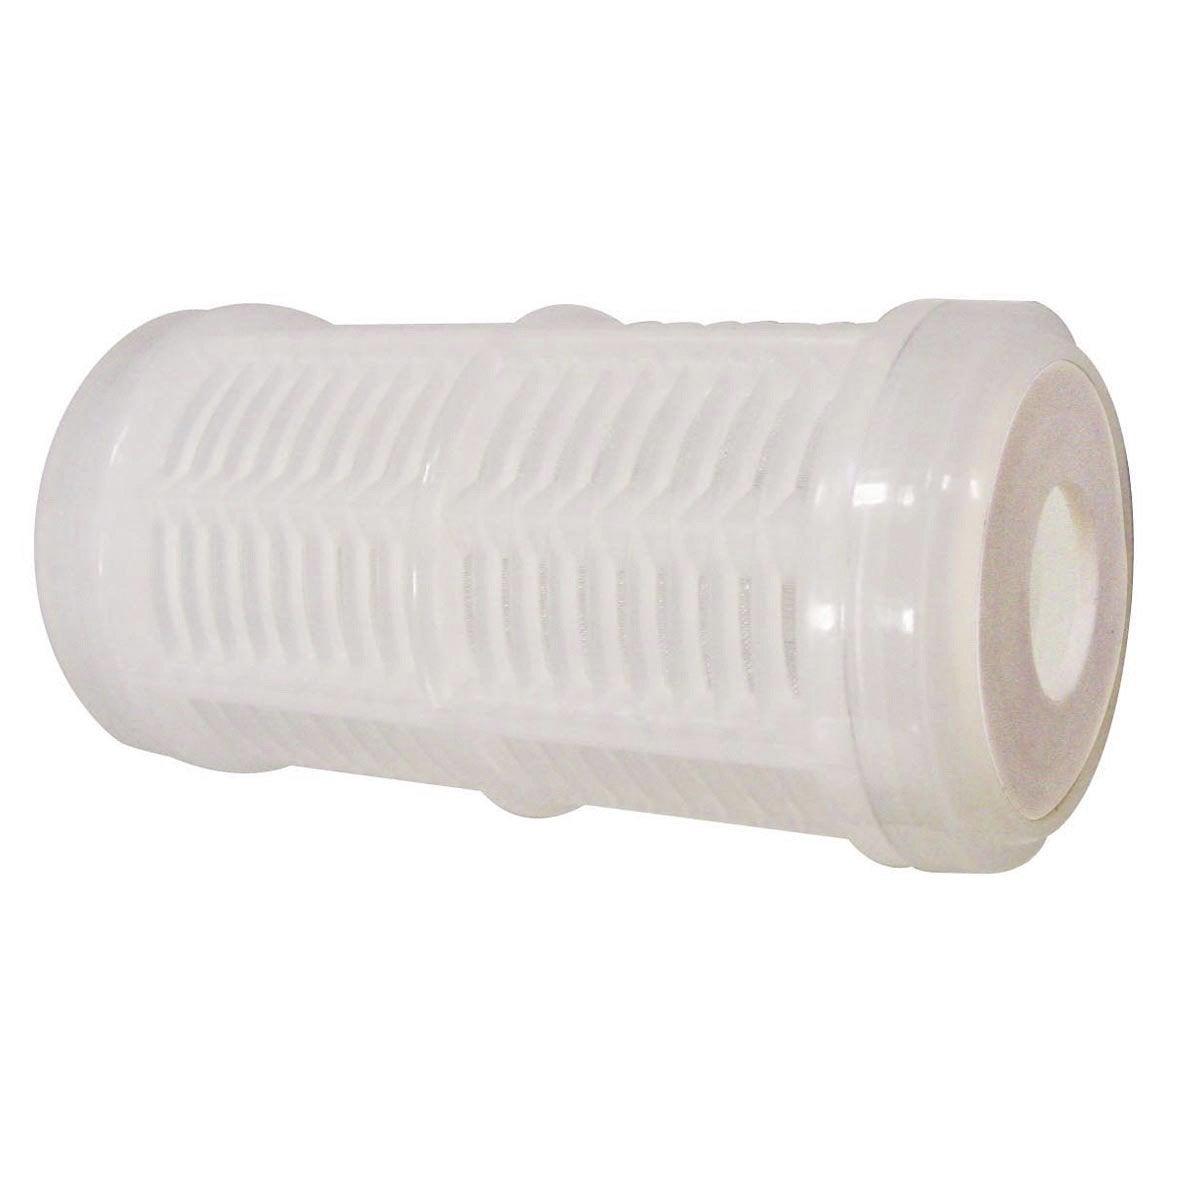 Cartouche pour filtre universel en polypropyl ne sterwins cannel cylindrique leroy merlin - Cartouche mitigeur leroy merlin ...